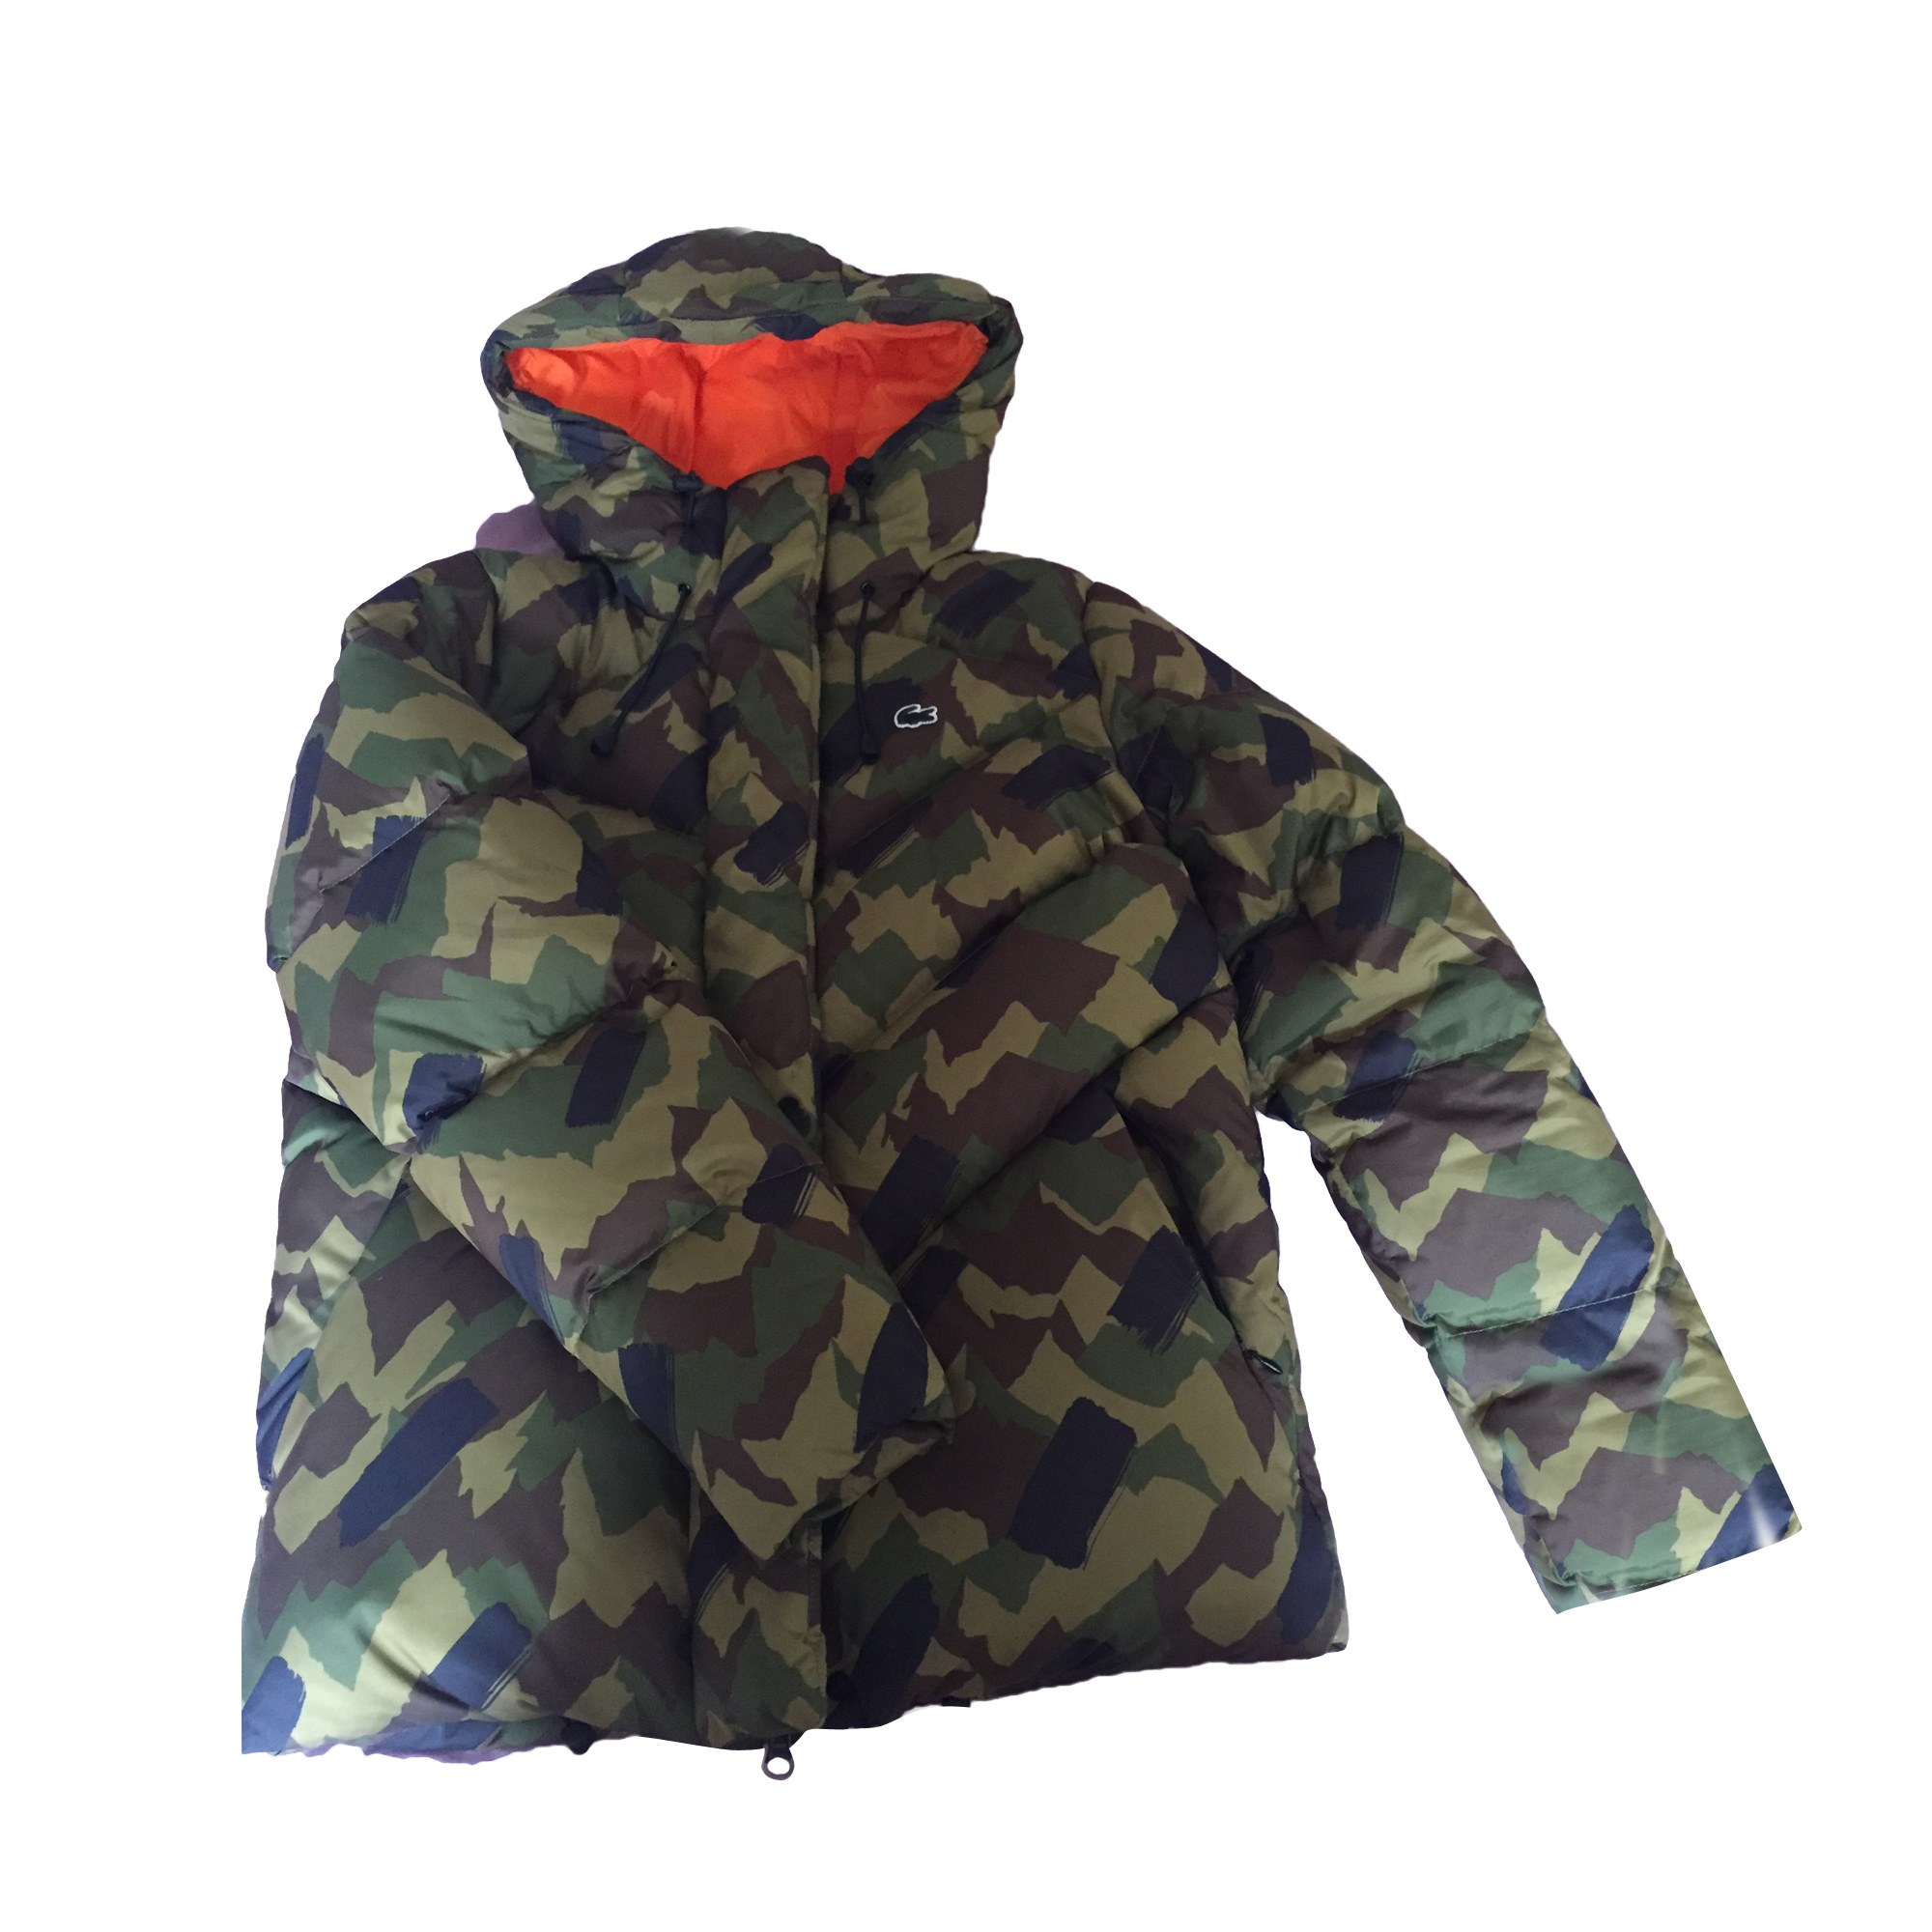 Camouflage Doudoune Doudoune Doudoune Lacoste Lacoste Camouflage N0kZnO8wPX